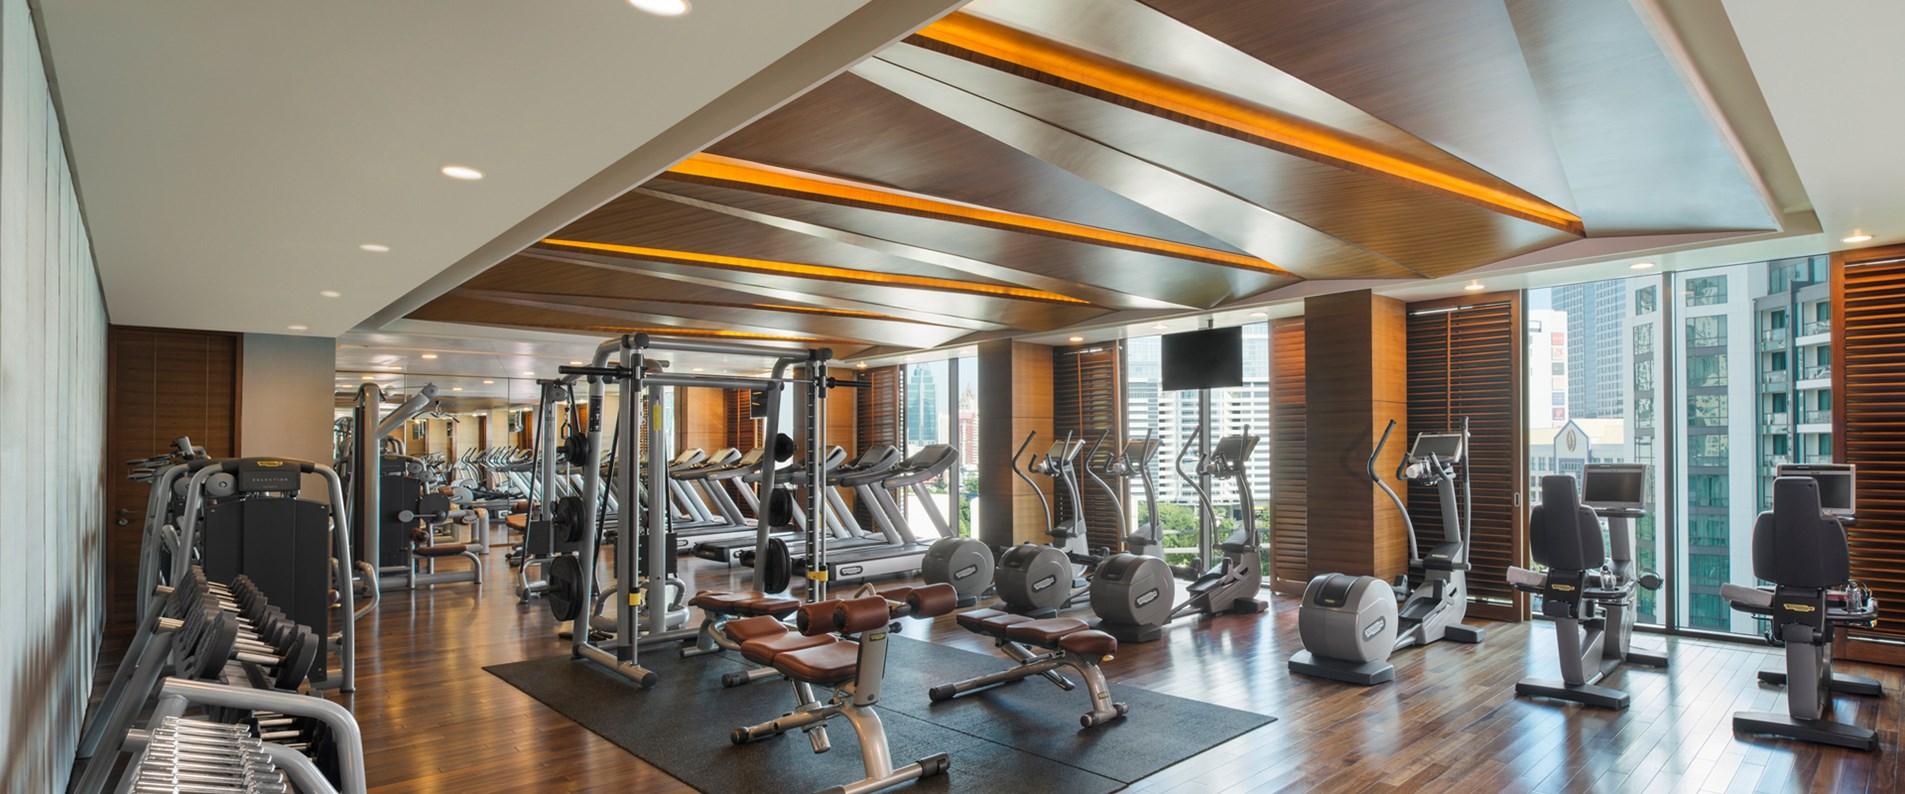 kibkk1-facilities-gym.jpg